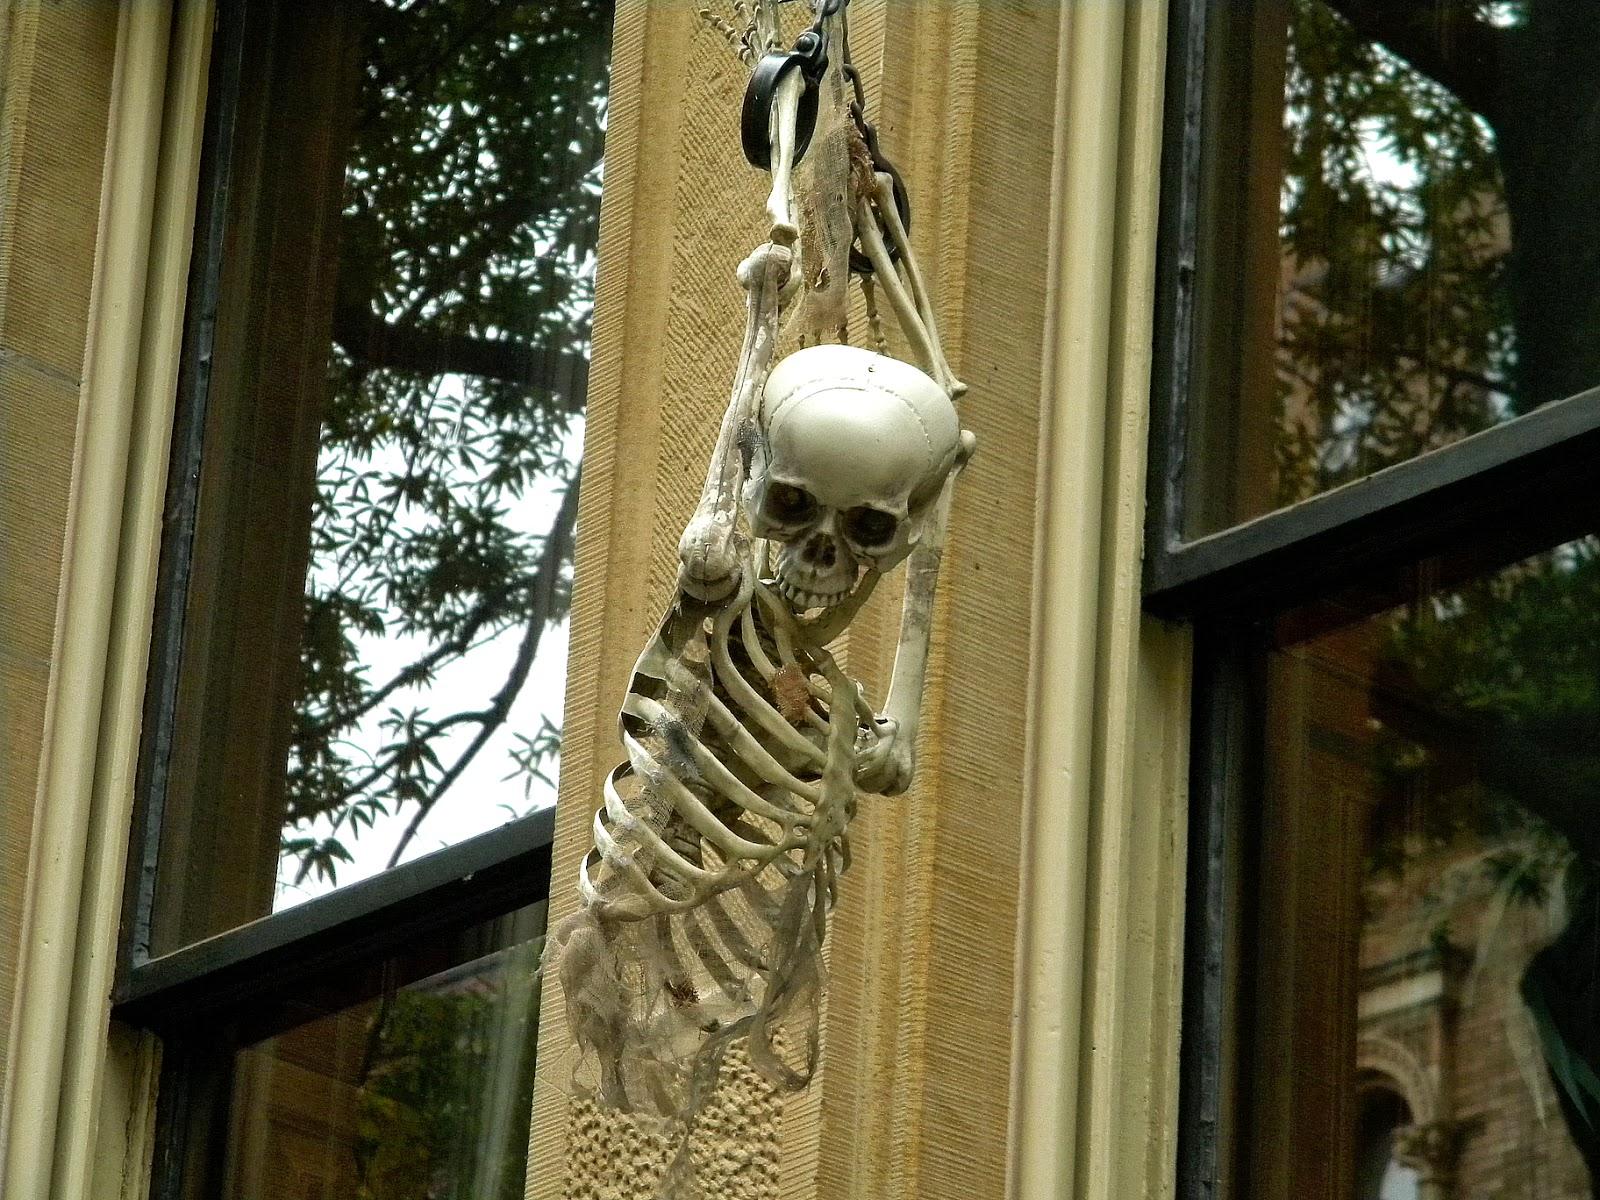 Halloween Decorations Manacled Hanging Skeleton Public ...